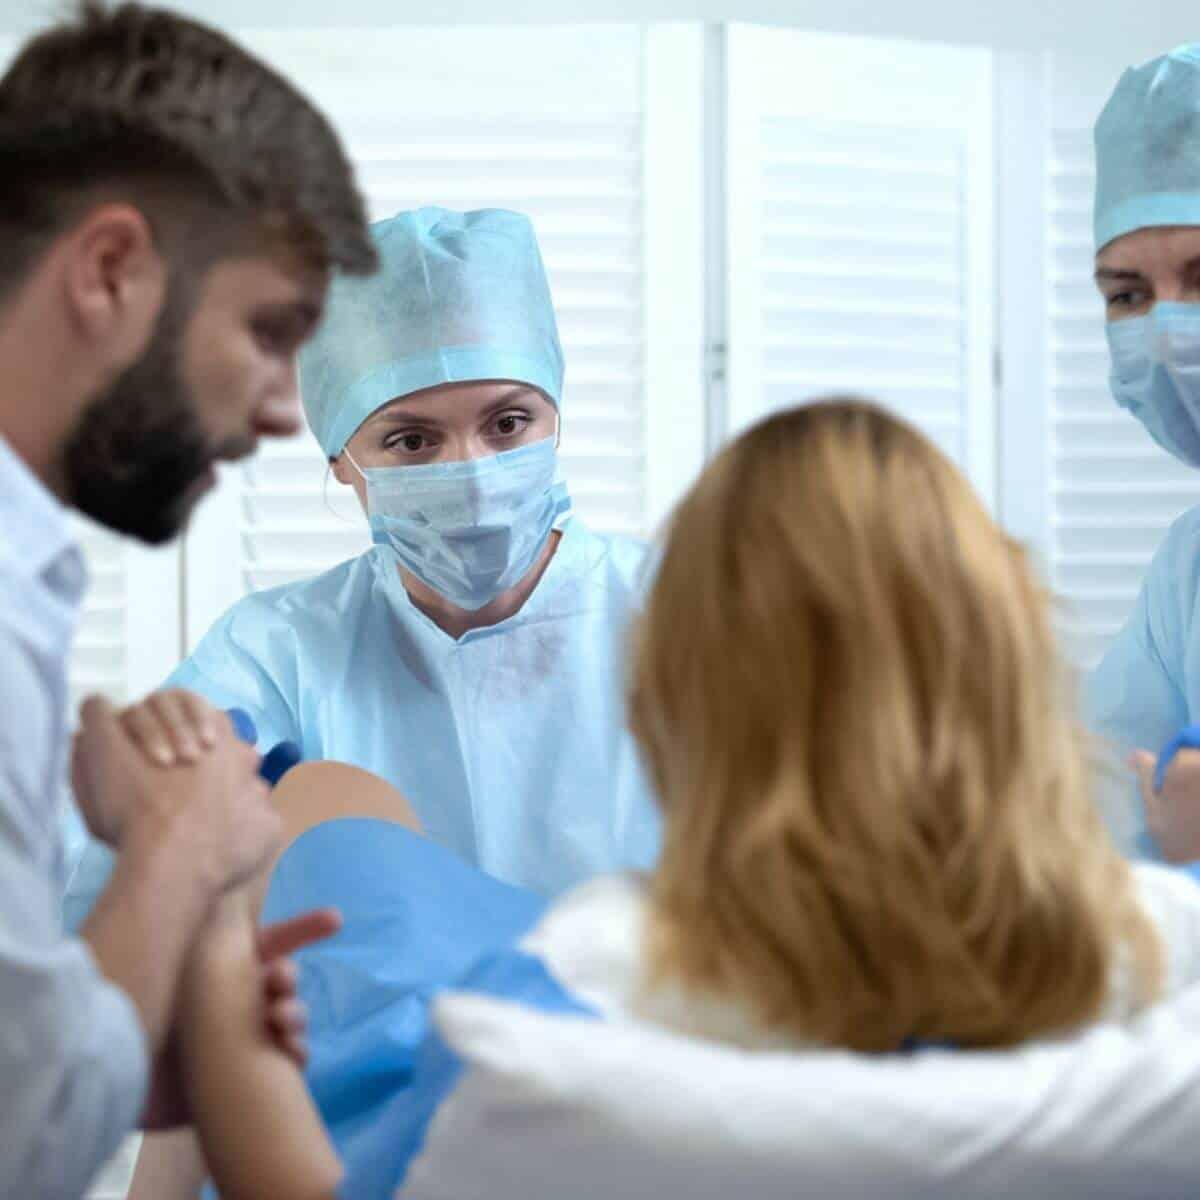 Woman in labor, the husband stitch